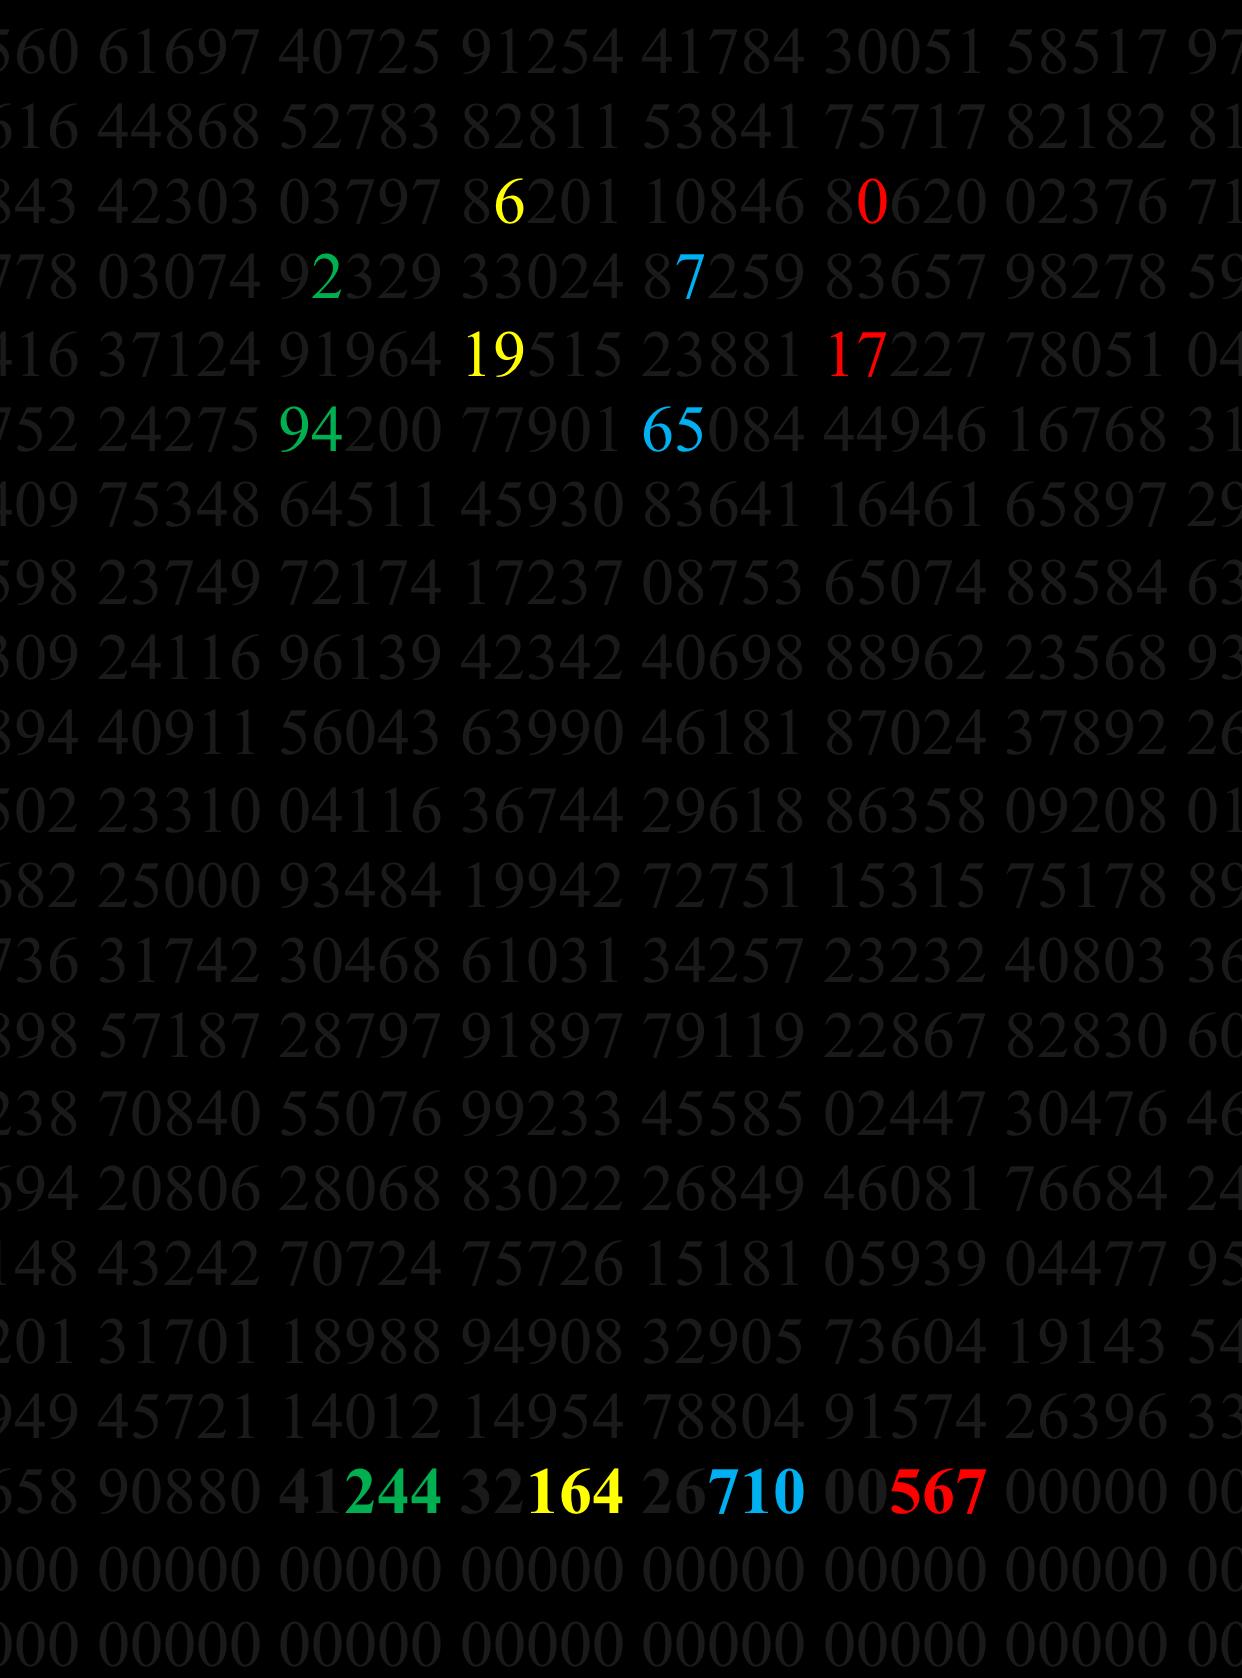 815617DB-6C58-4021-86FE-D6EAABD67835.jpeg